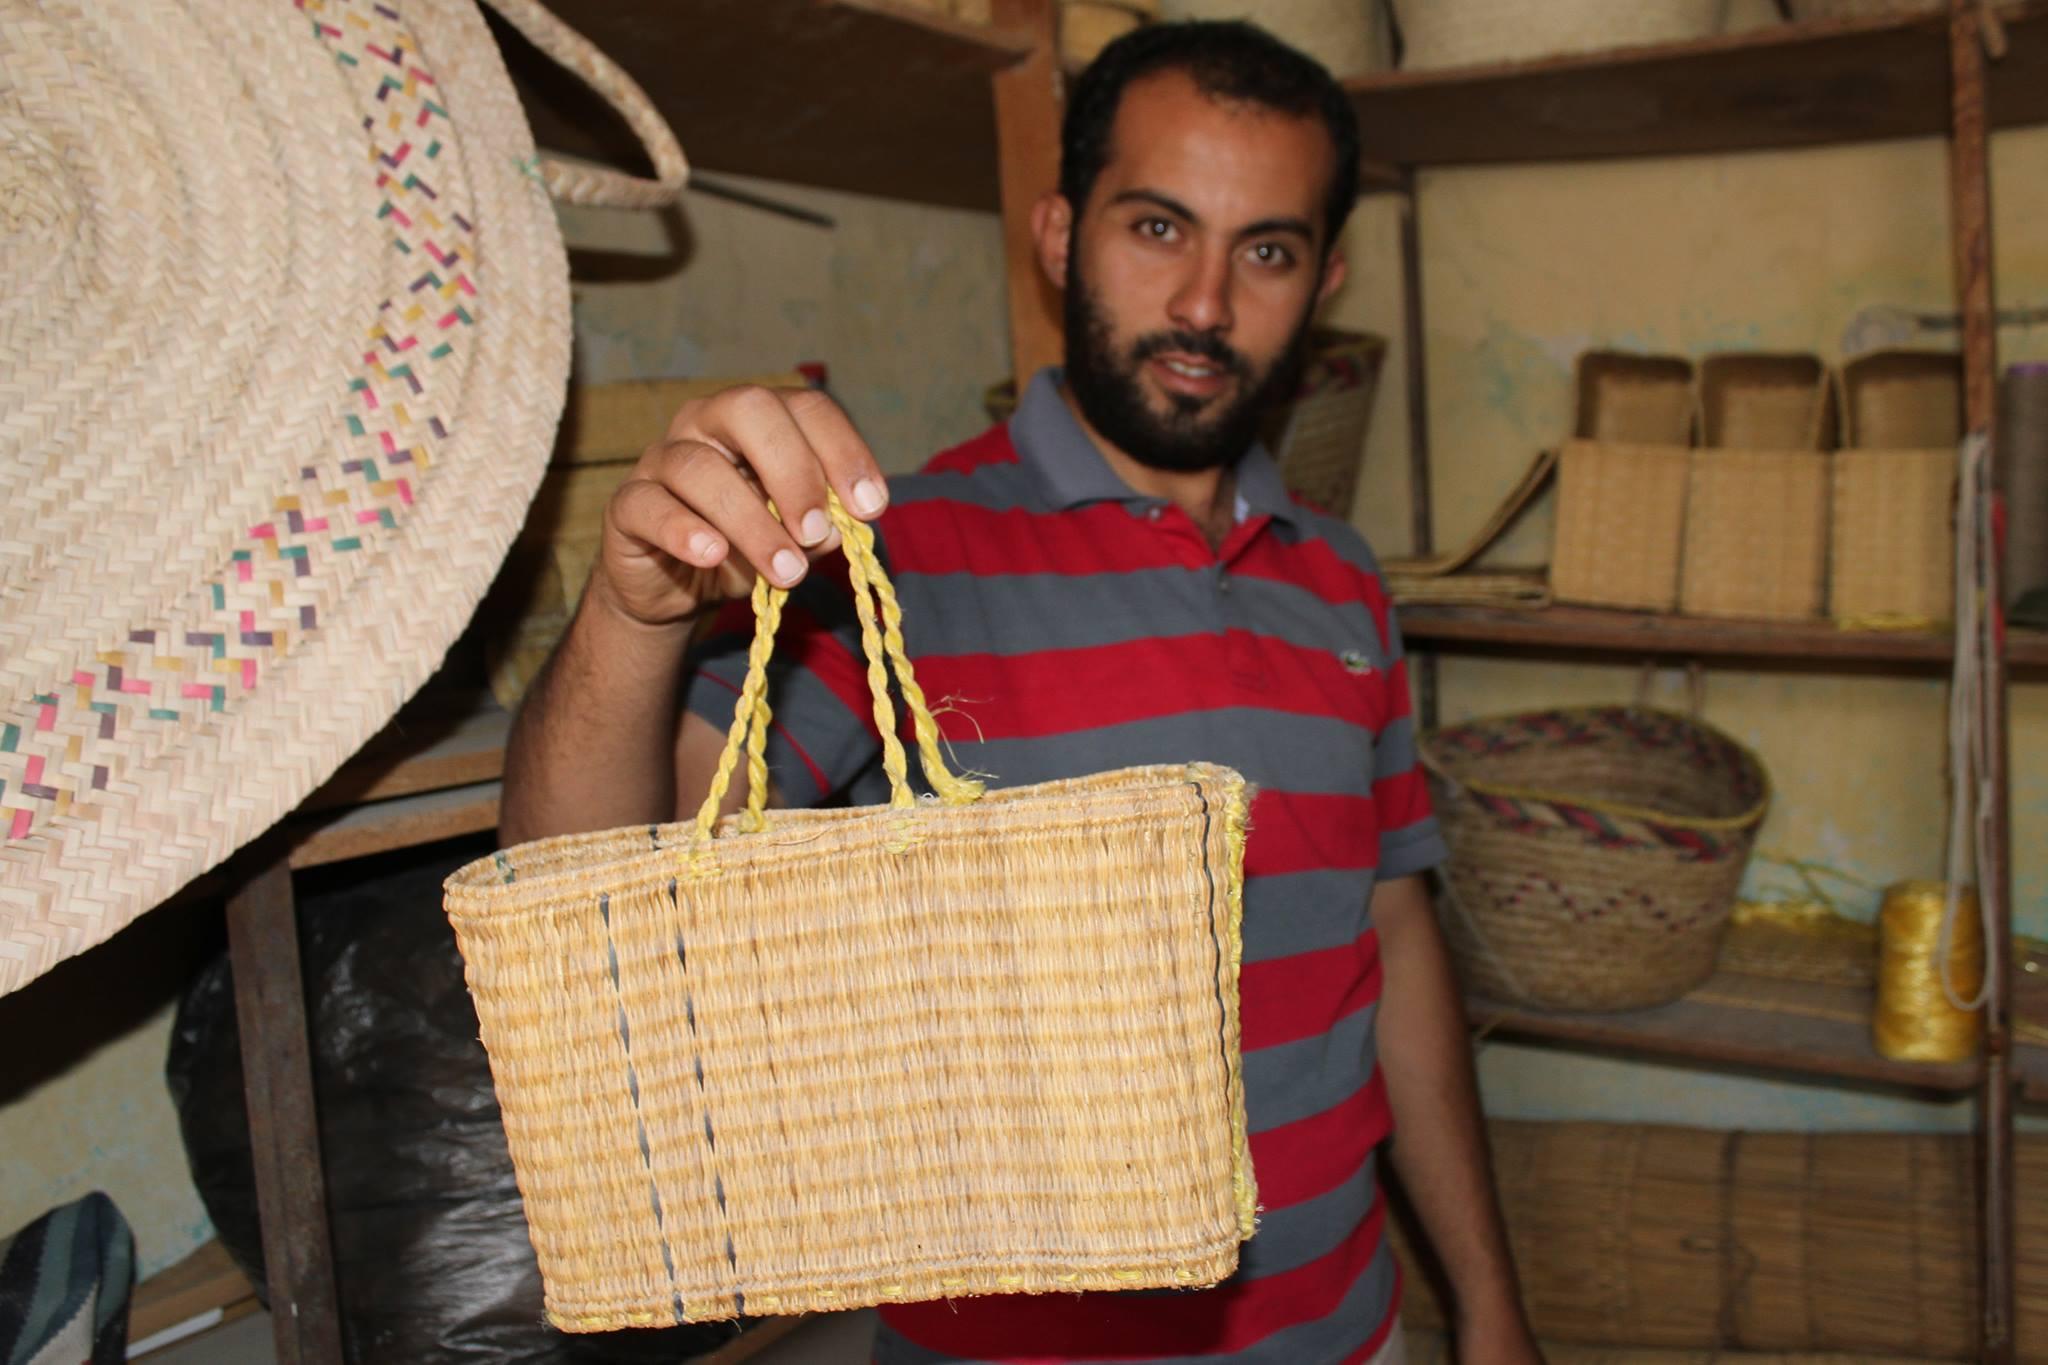 A craftsman making beautiful baskets from wetland plants. Photo: H. Naoufel